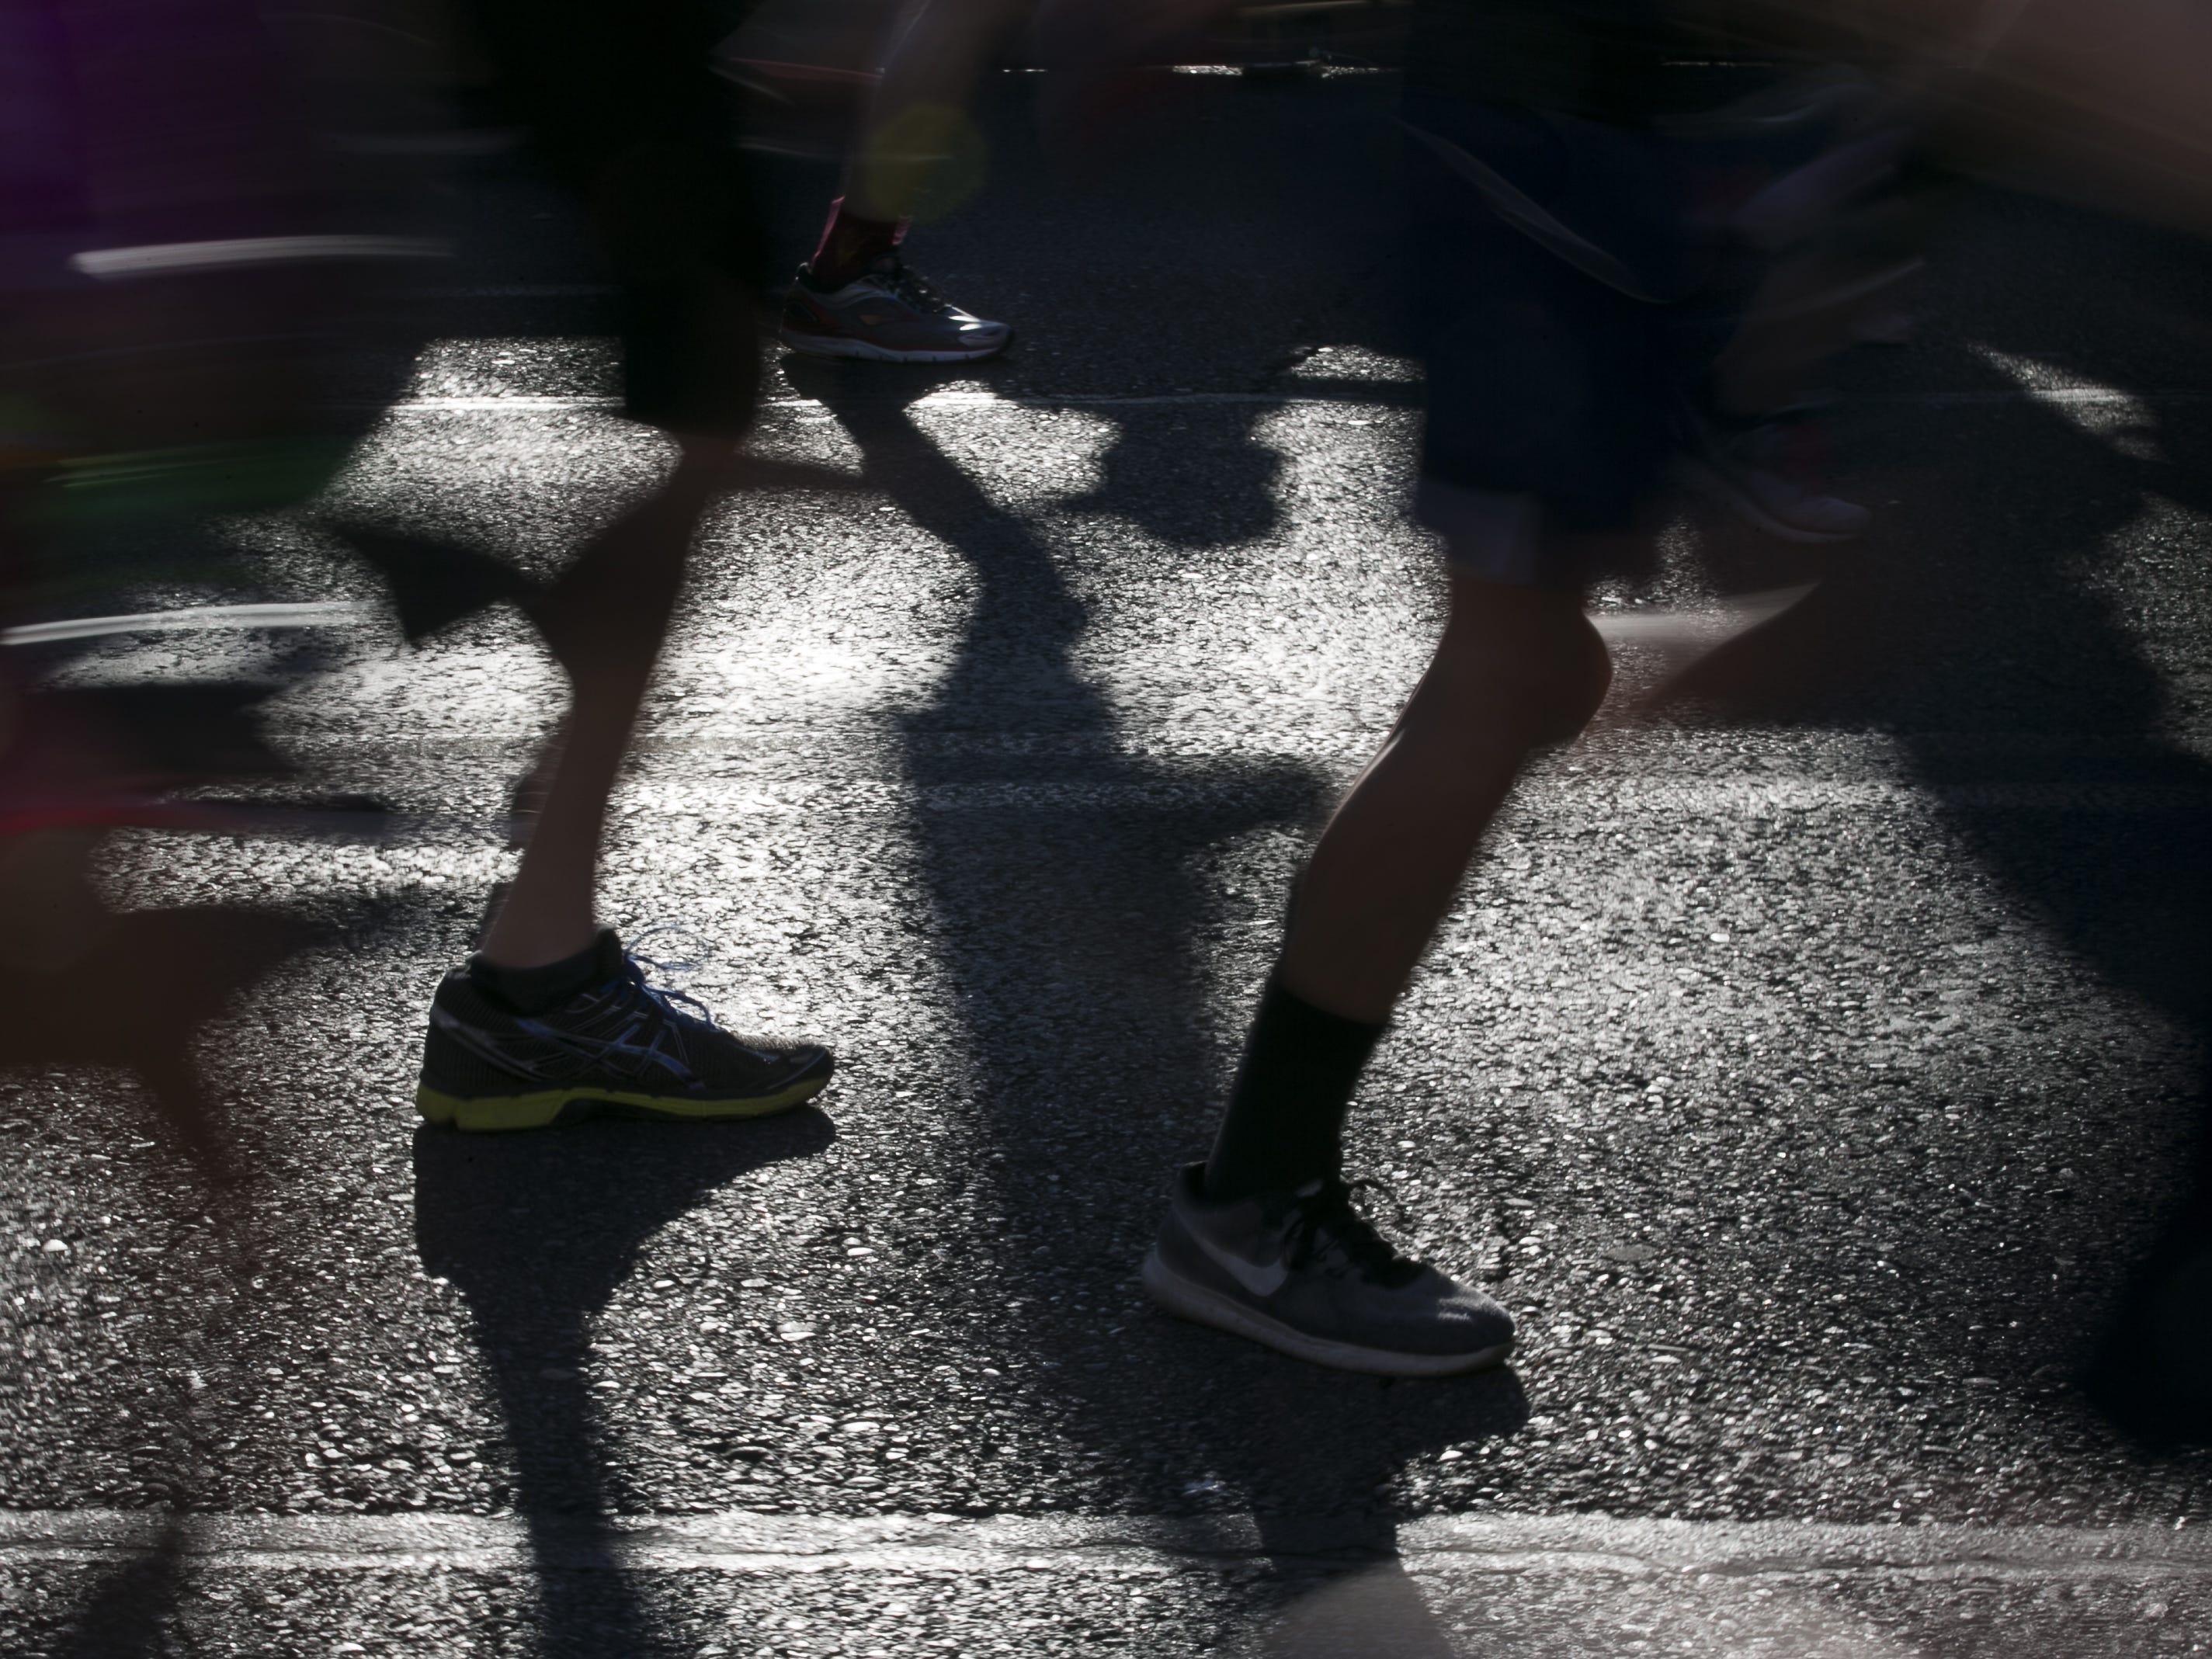 Runners participate Pat's Run 2019 in Tempe on April 27, 2019.